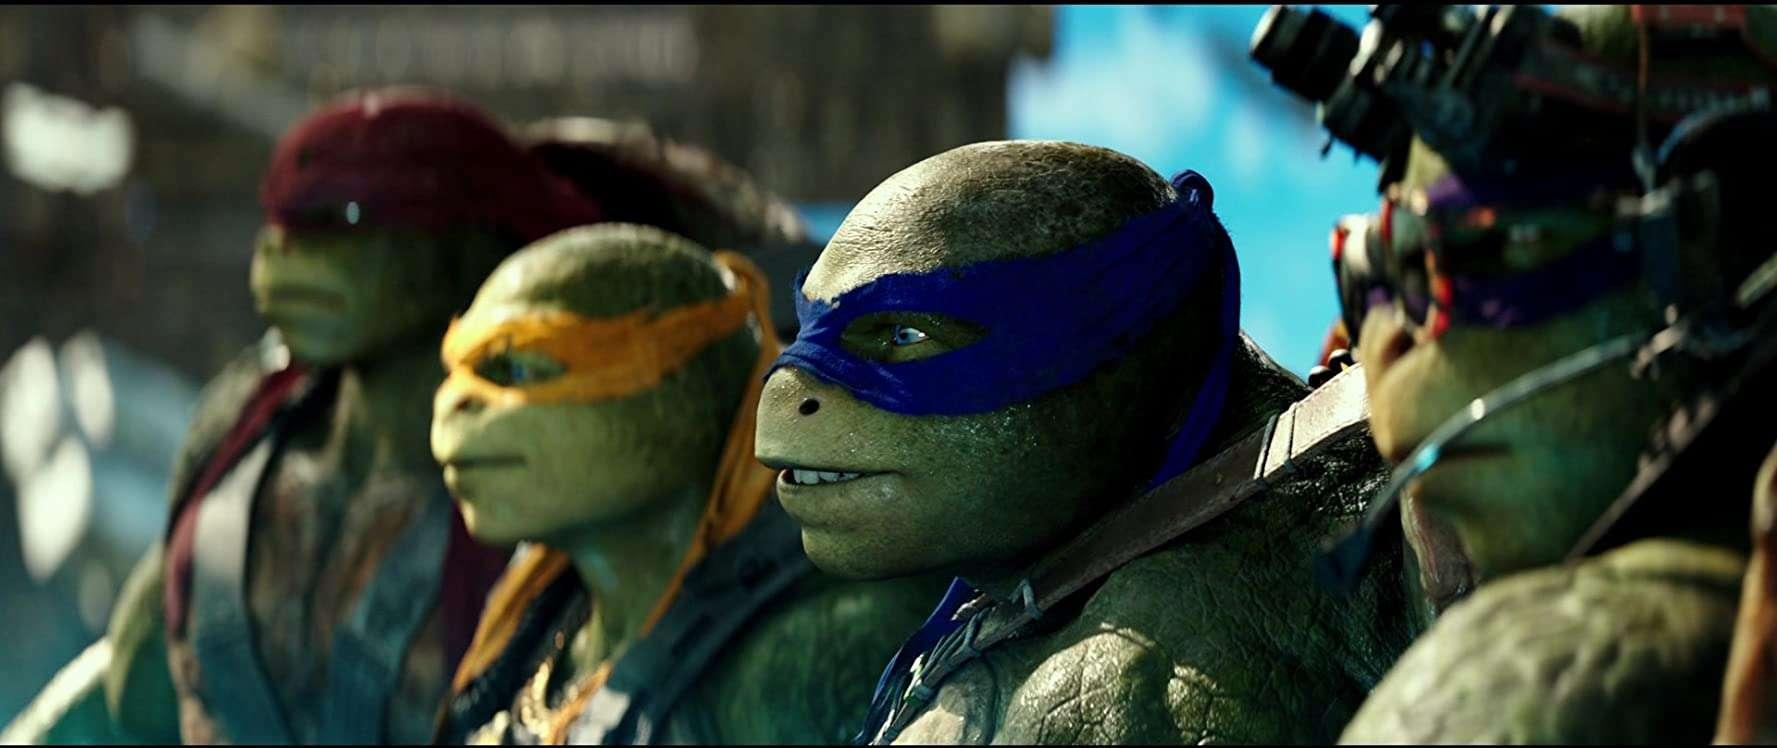 Teeange-Mutant-Ninja-Turtles-Out-of-the-Shadows-2016